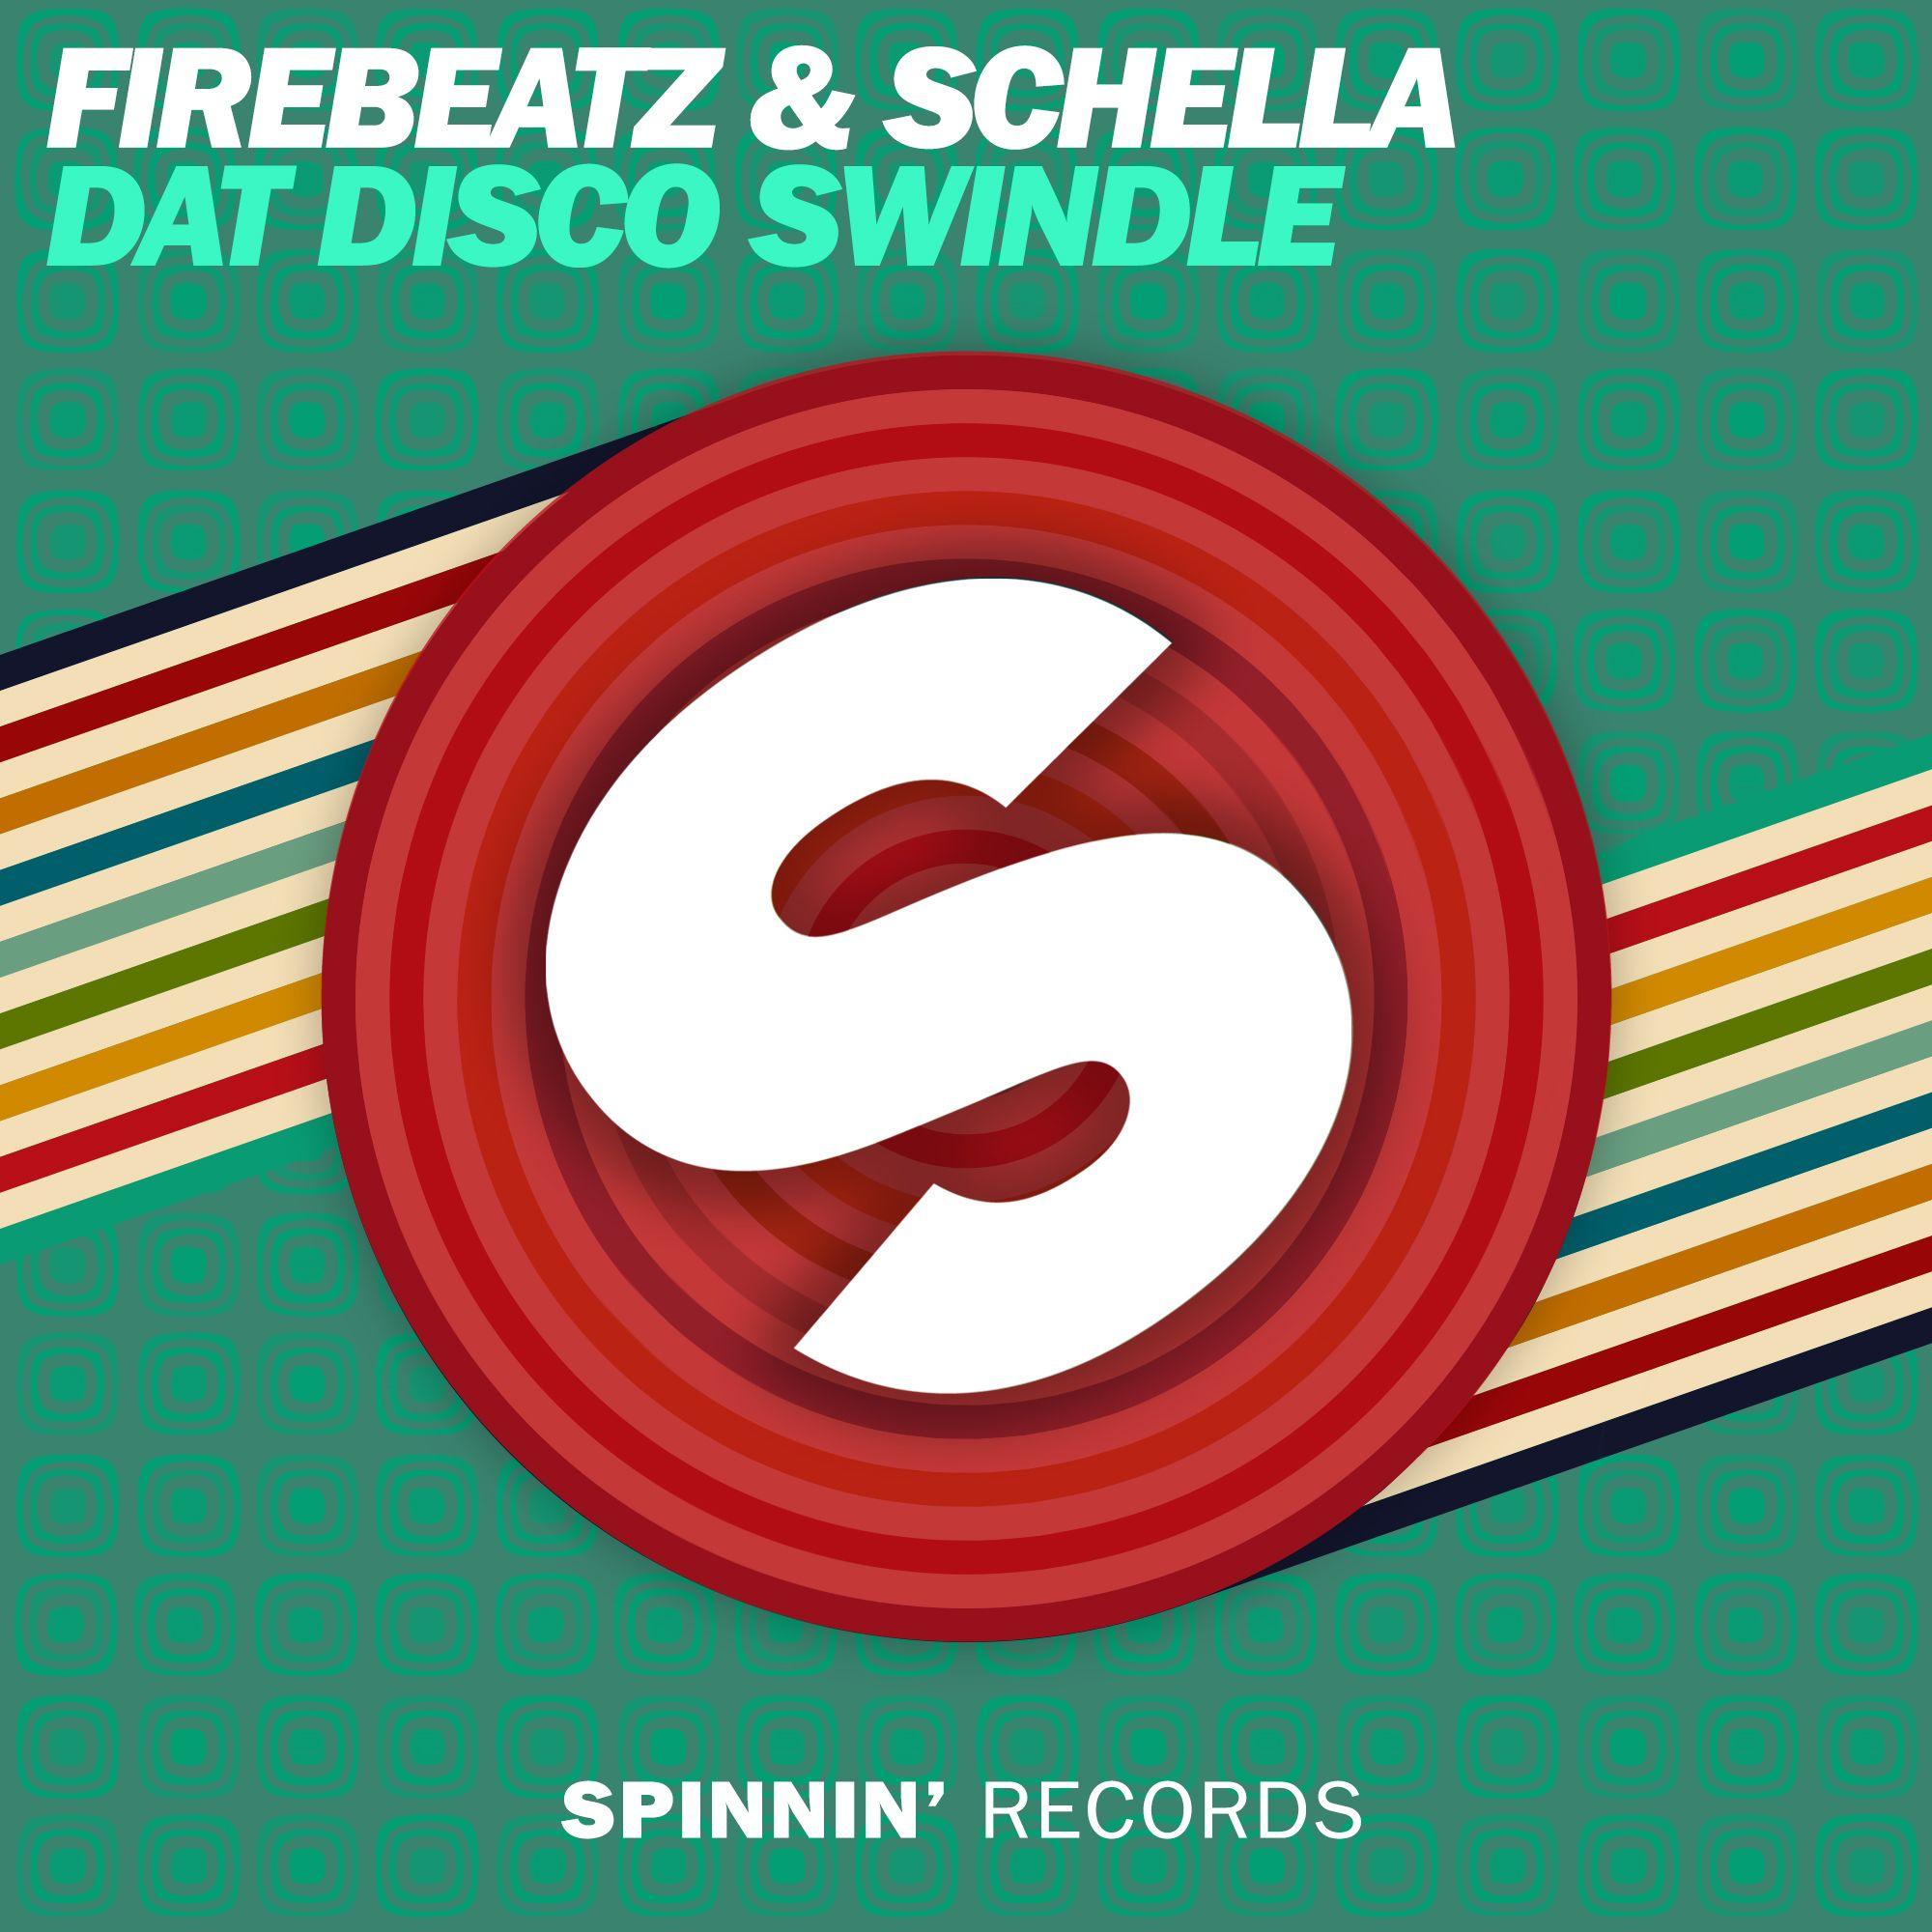 spinnin_firebeatz_schella_-_dat_disco_swindle.jpg